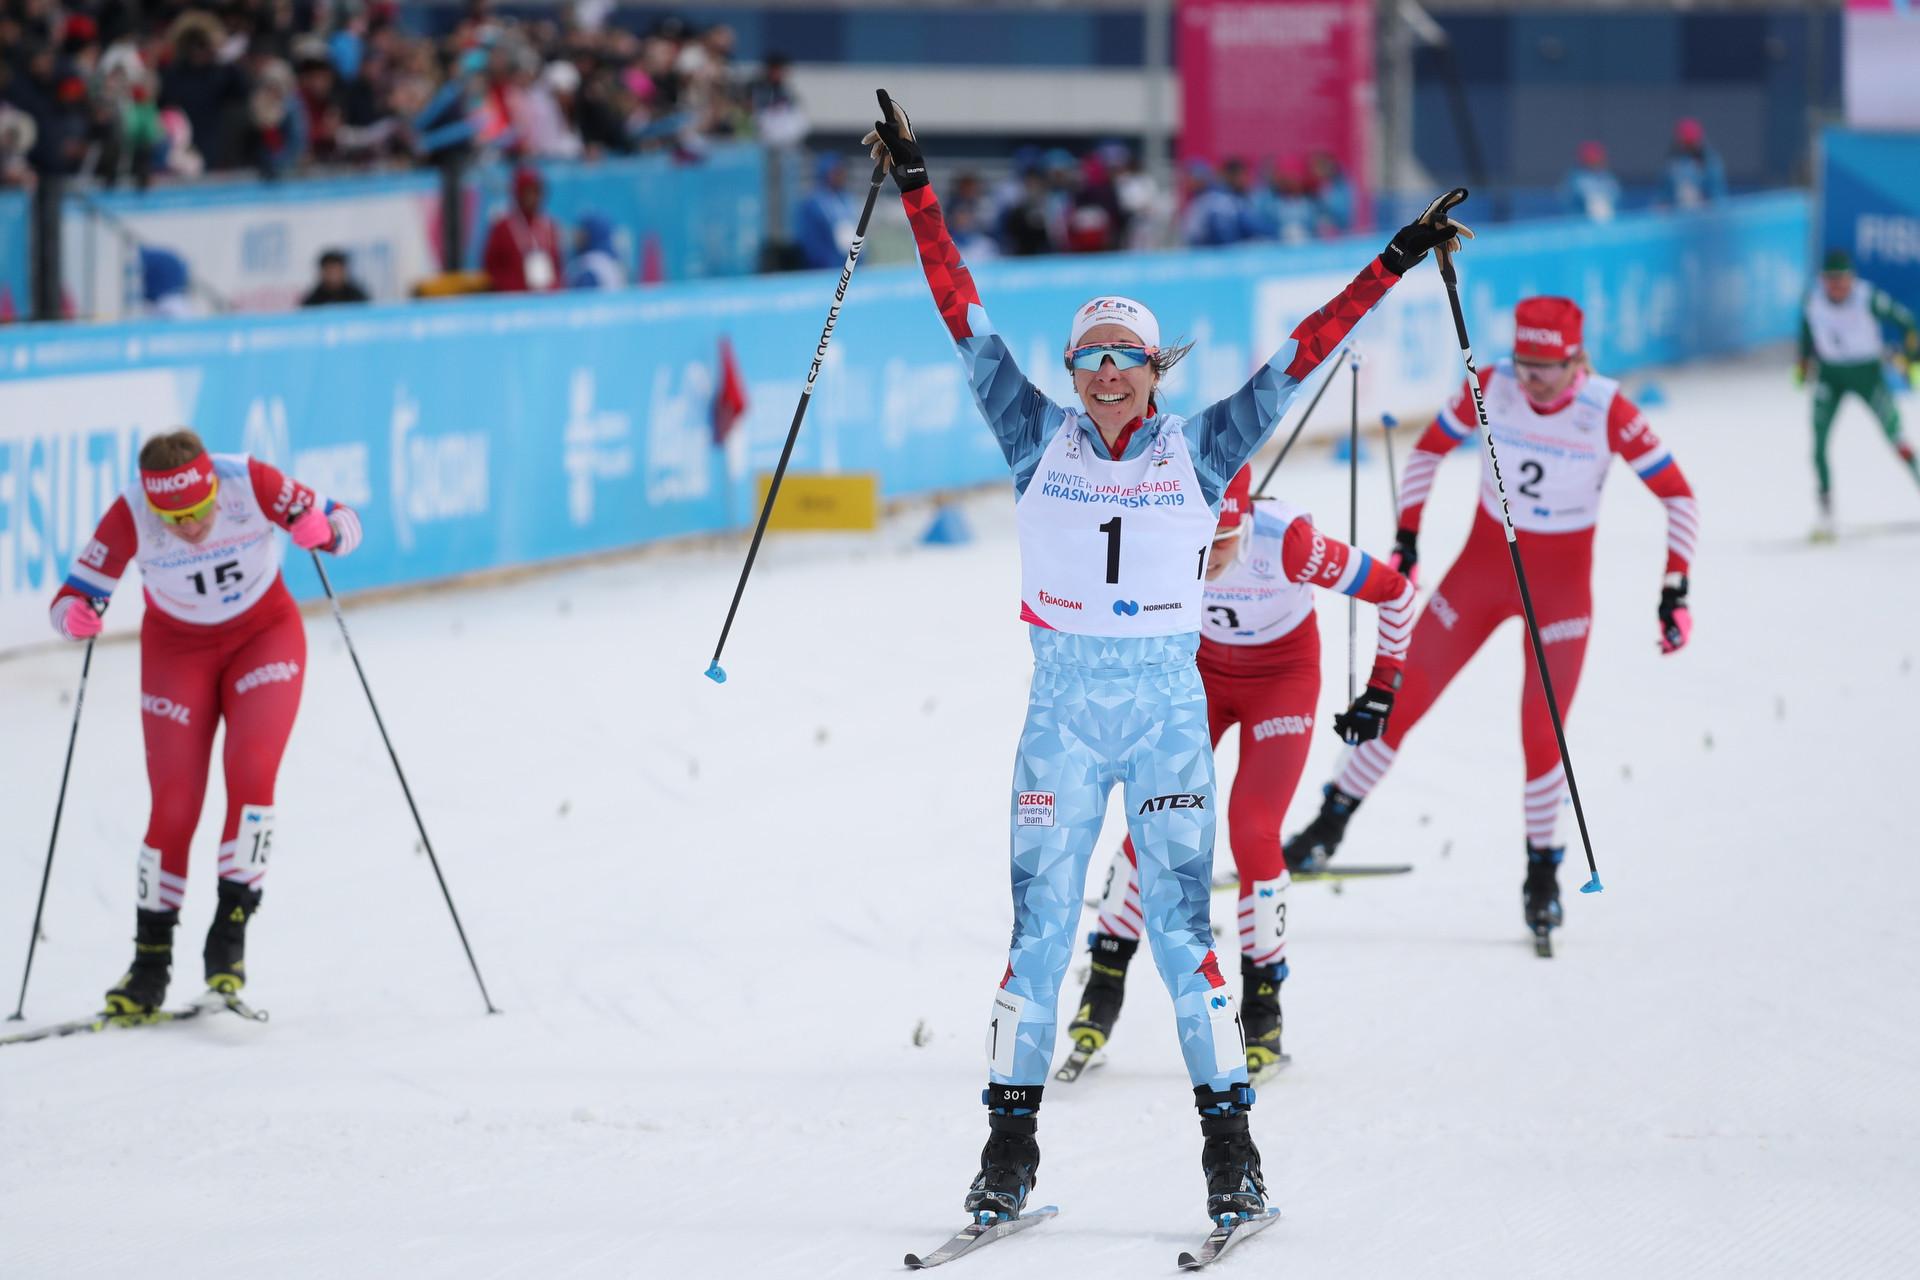 Czech skier Hyncicova ends Russian cross-country domination at Krasnoyarsk 2019 Winter Universiade